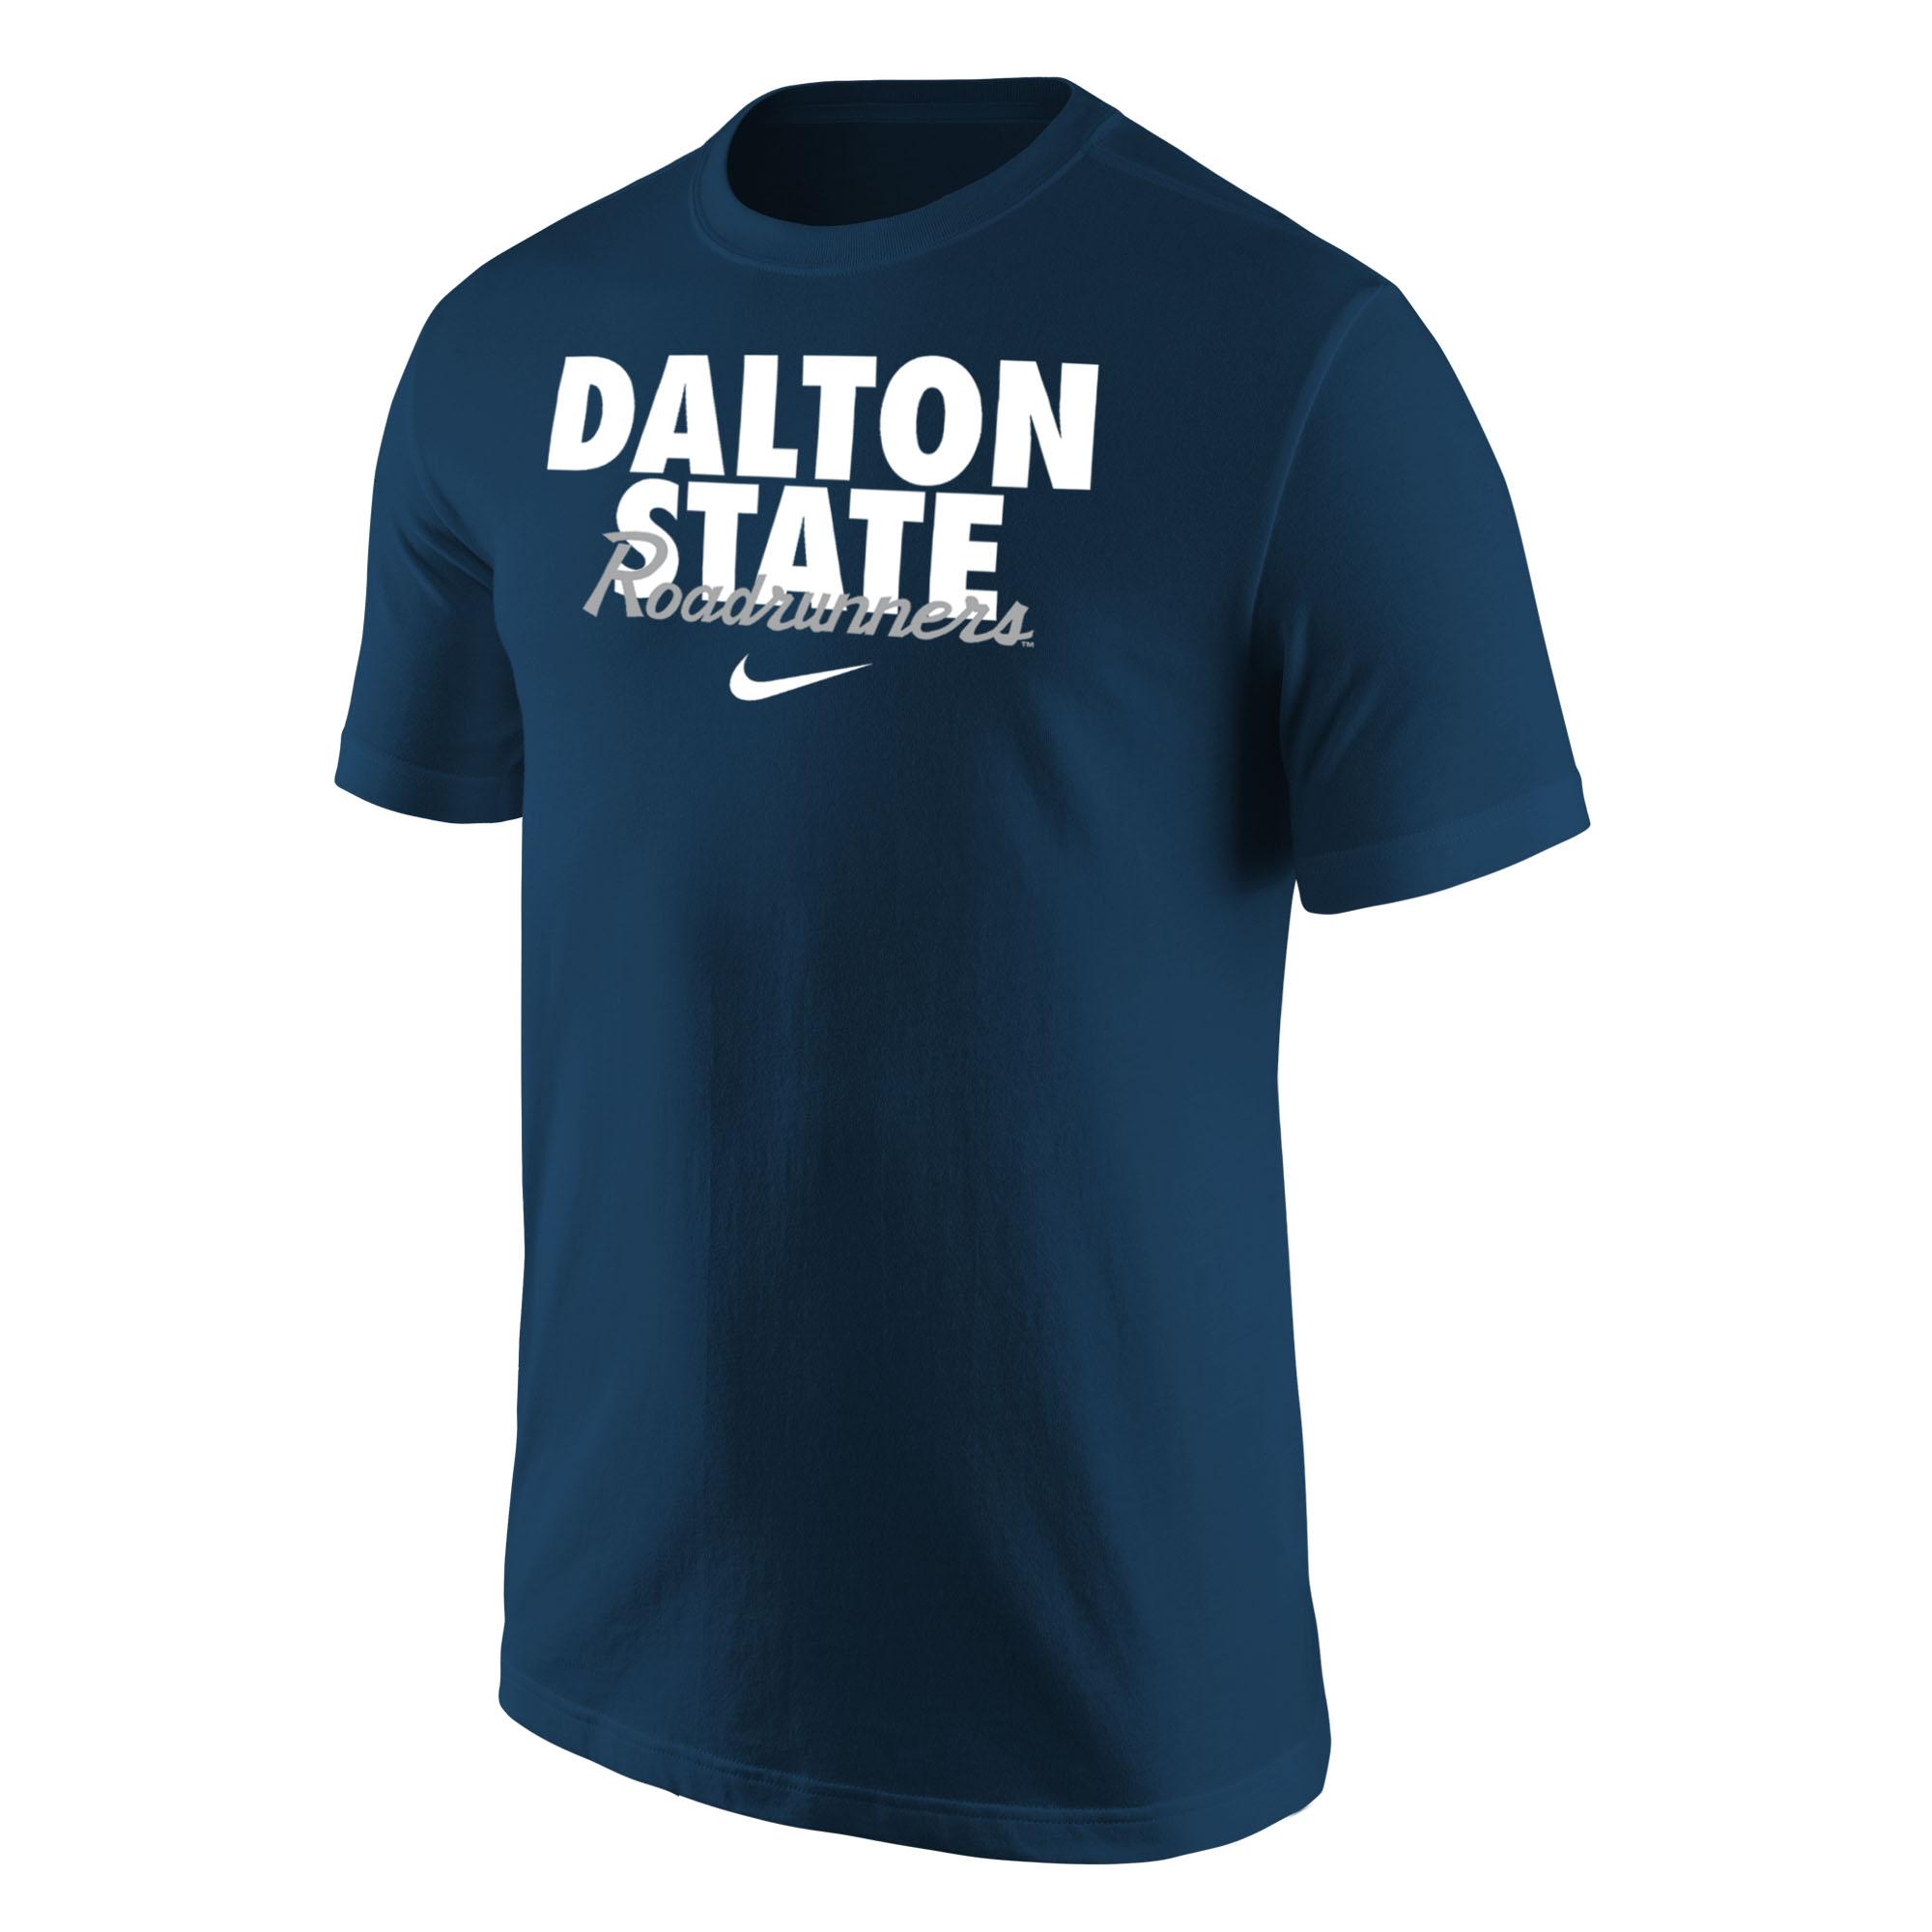 Dalton State Roadrunners Nike® Core Shirt